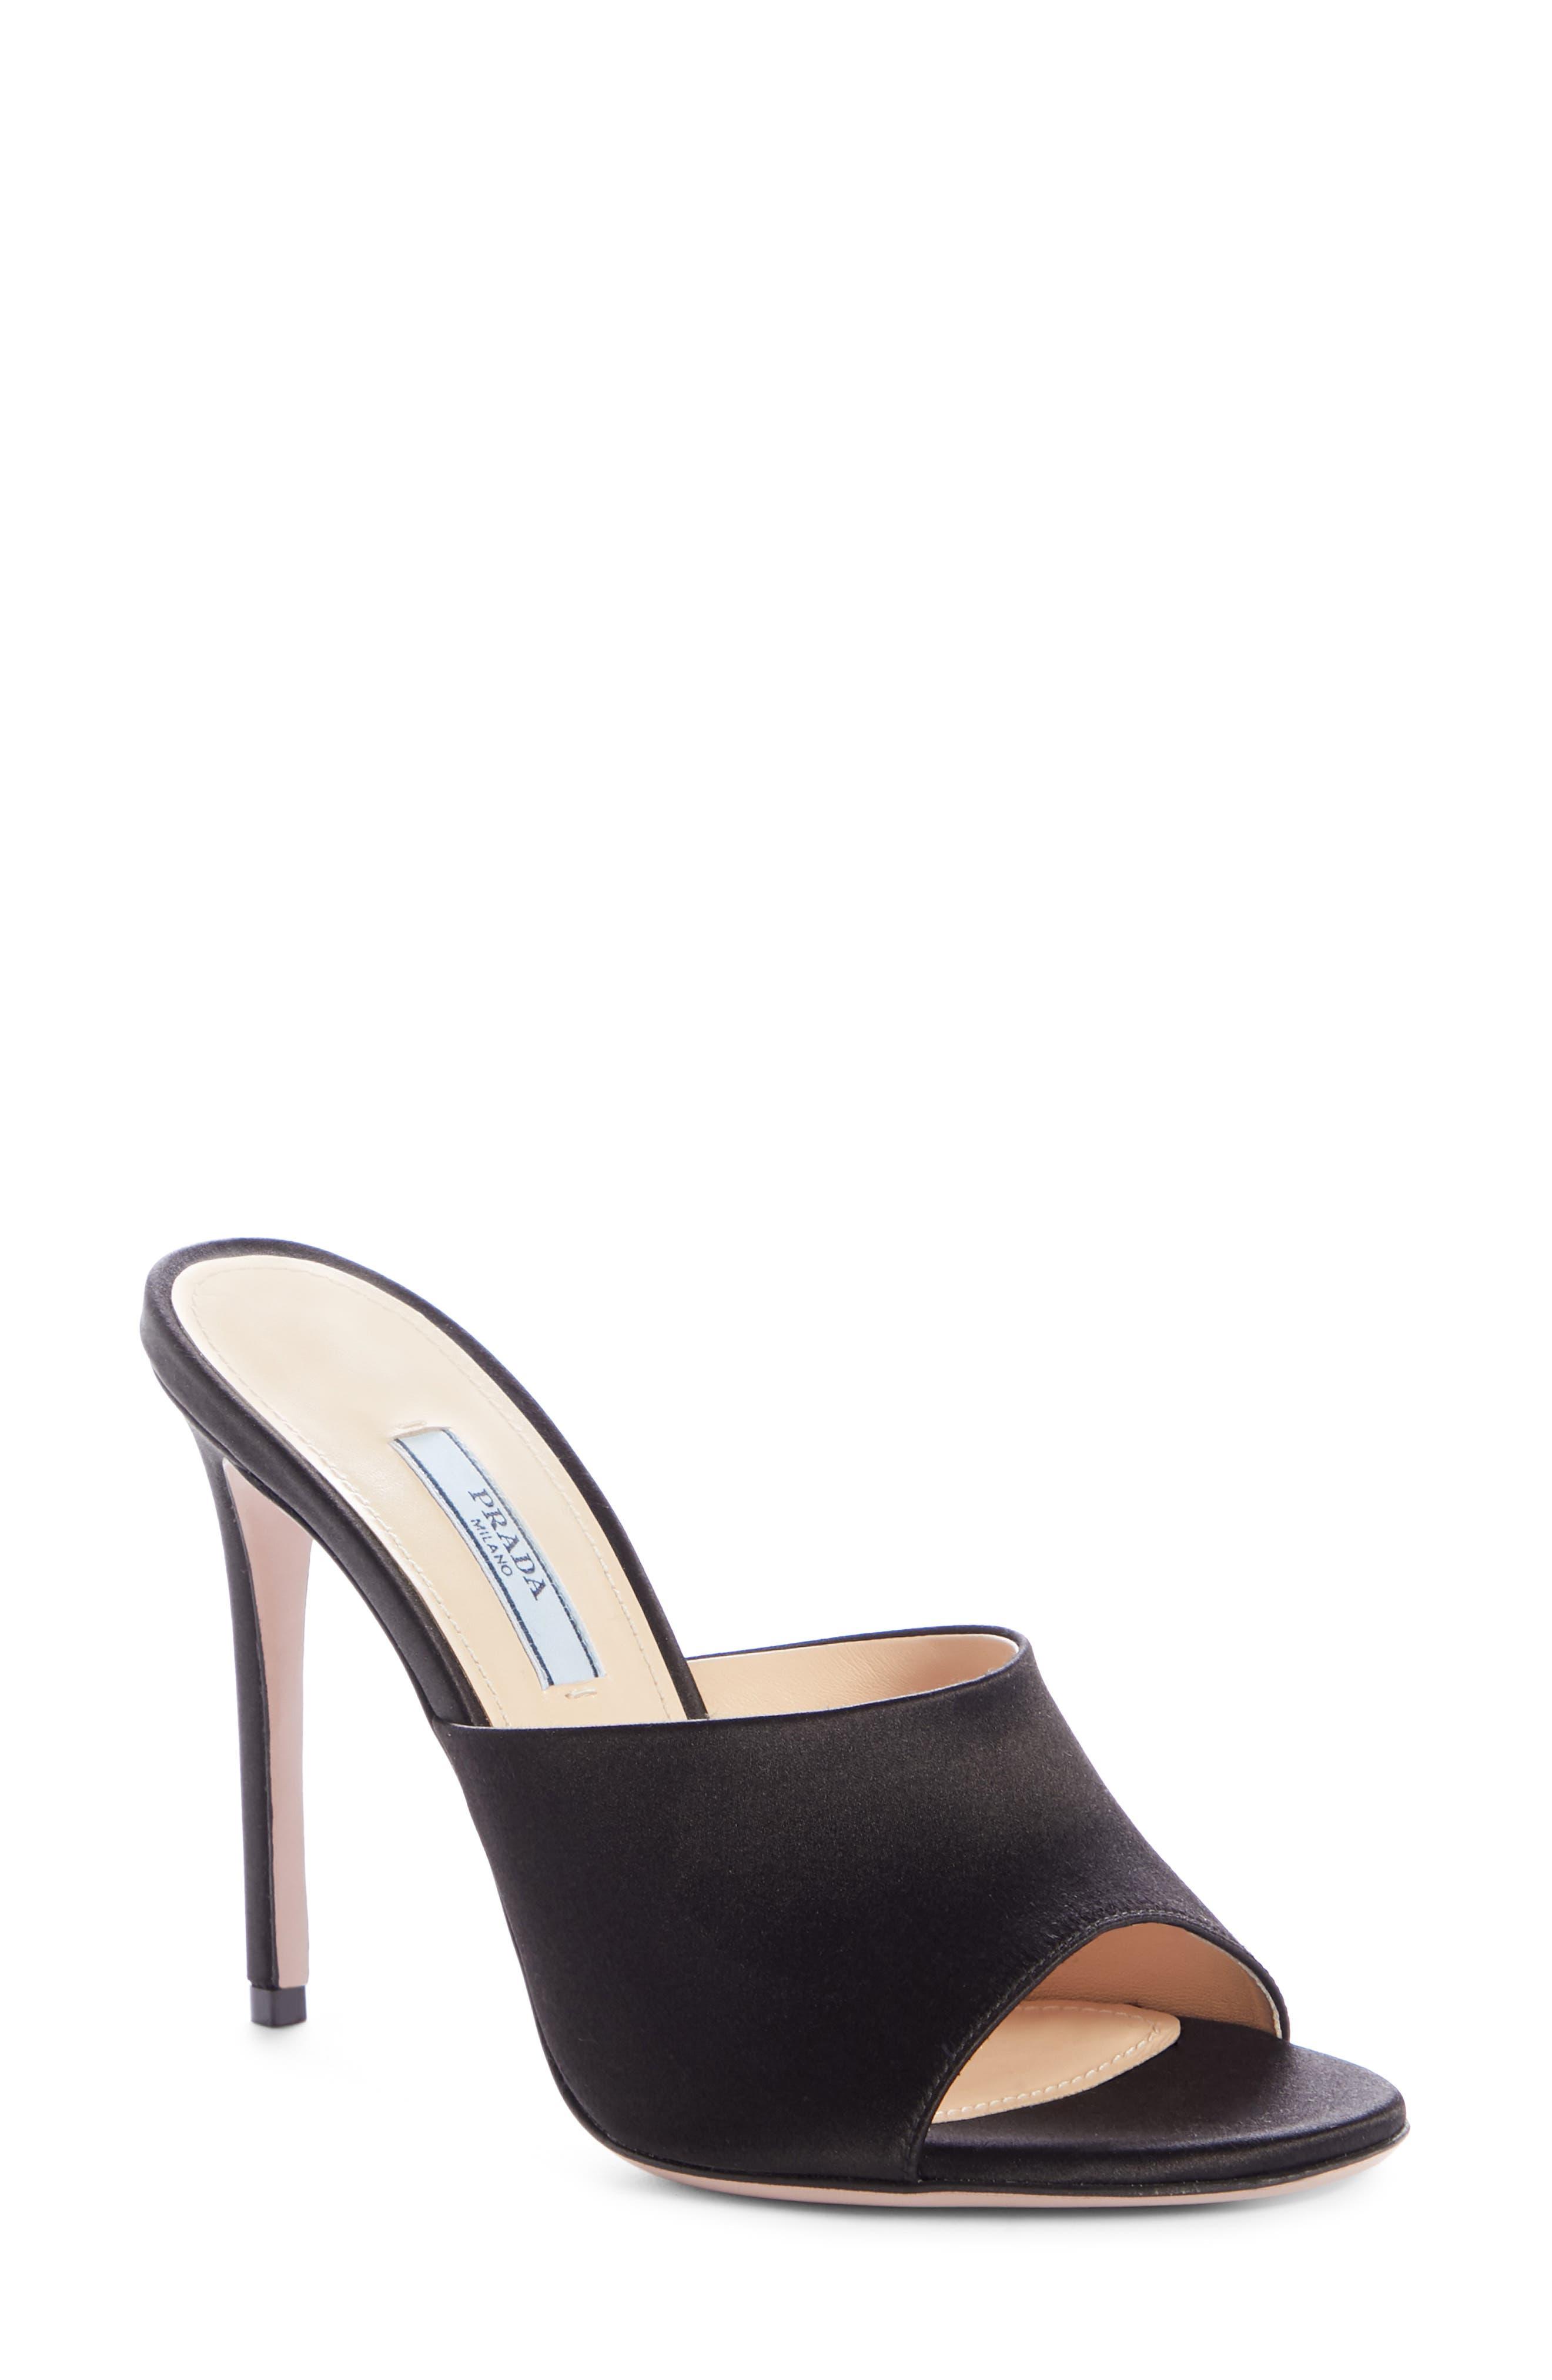 Mule Sandal,                             Main thumbnail 1, color,                             BLACK SILK